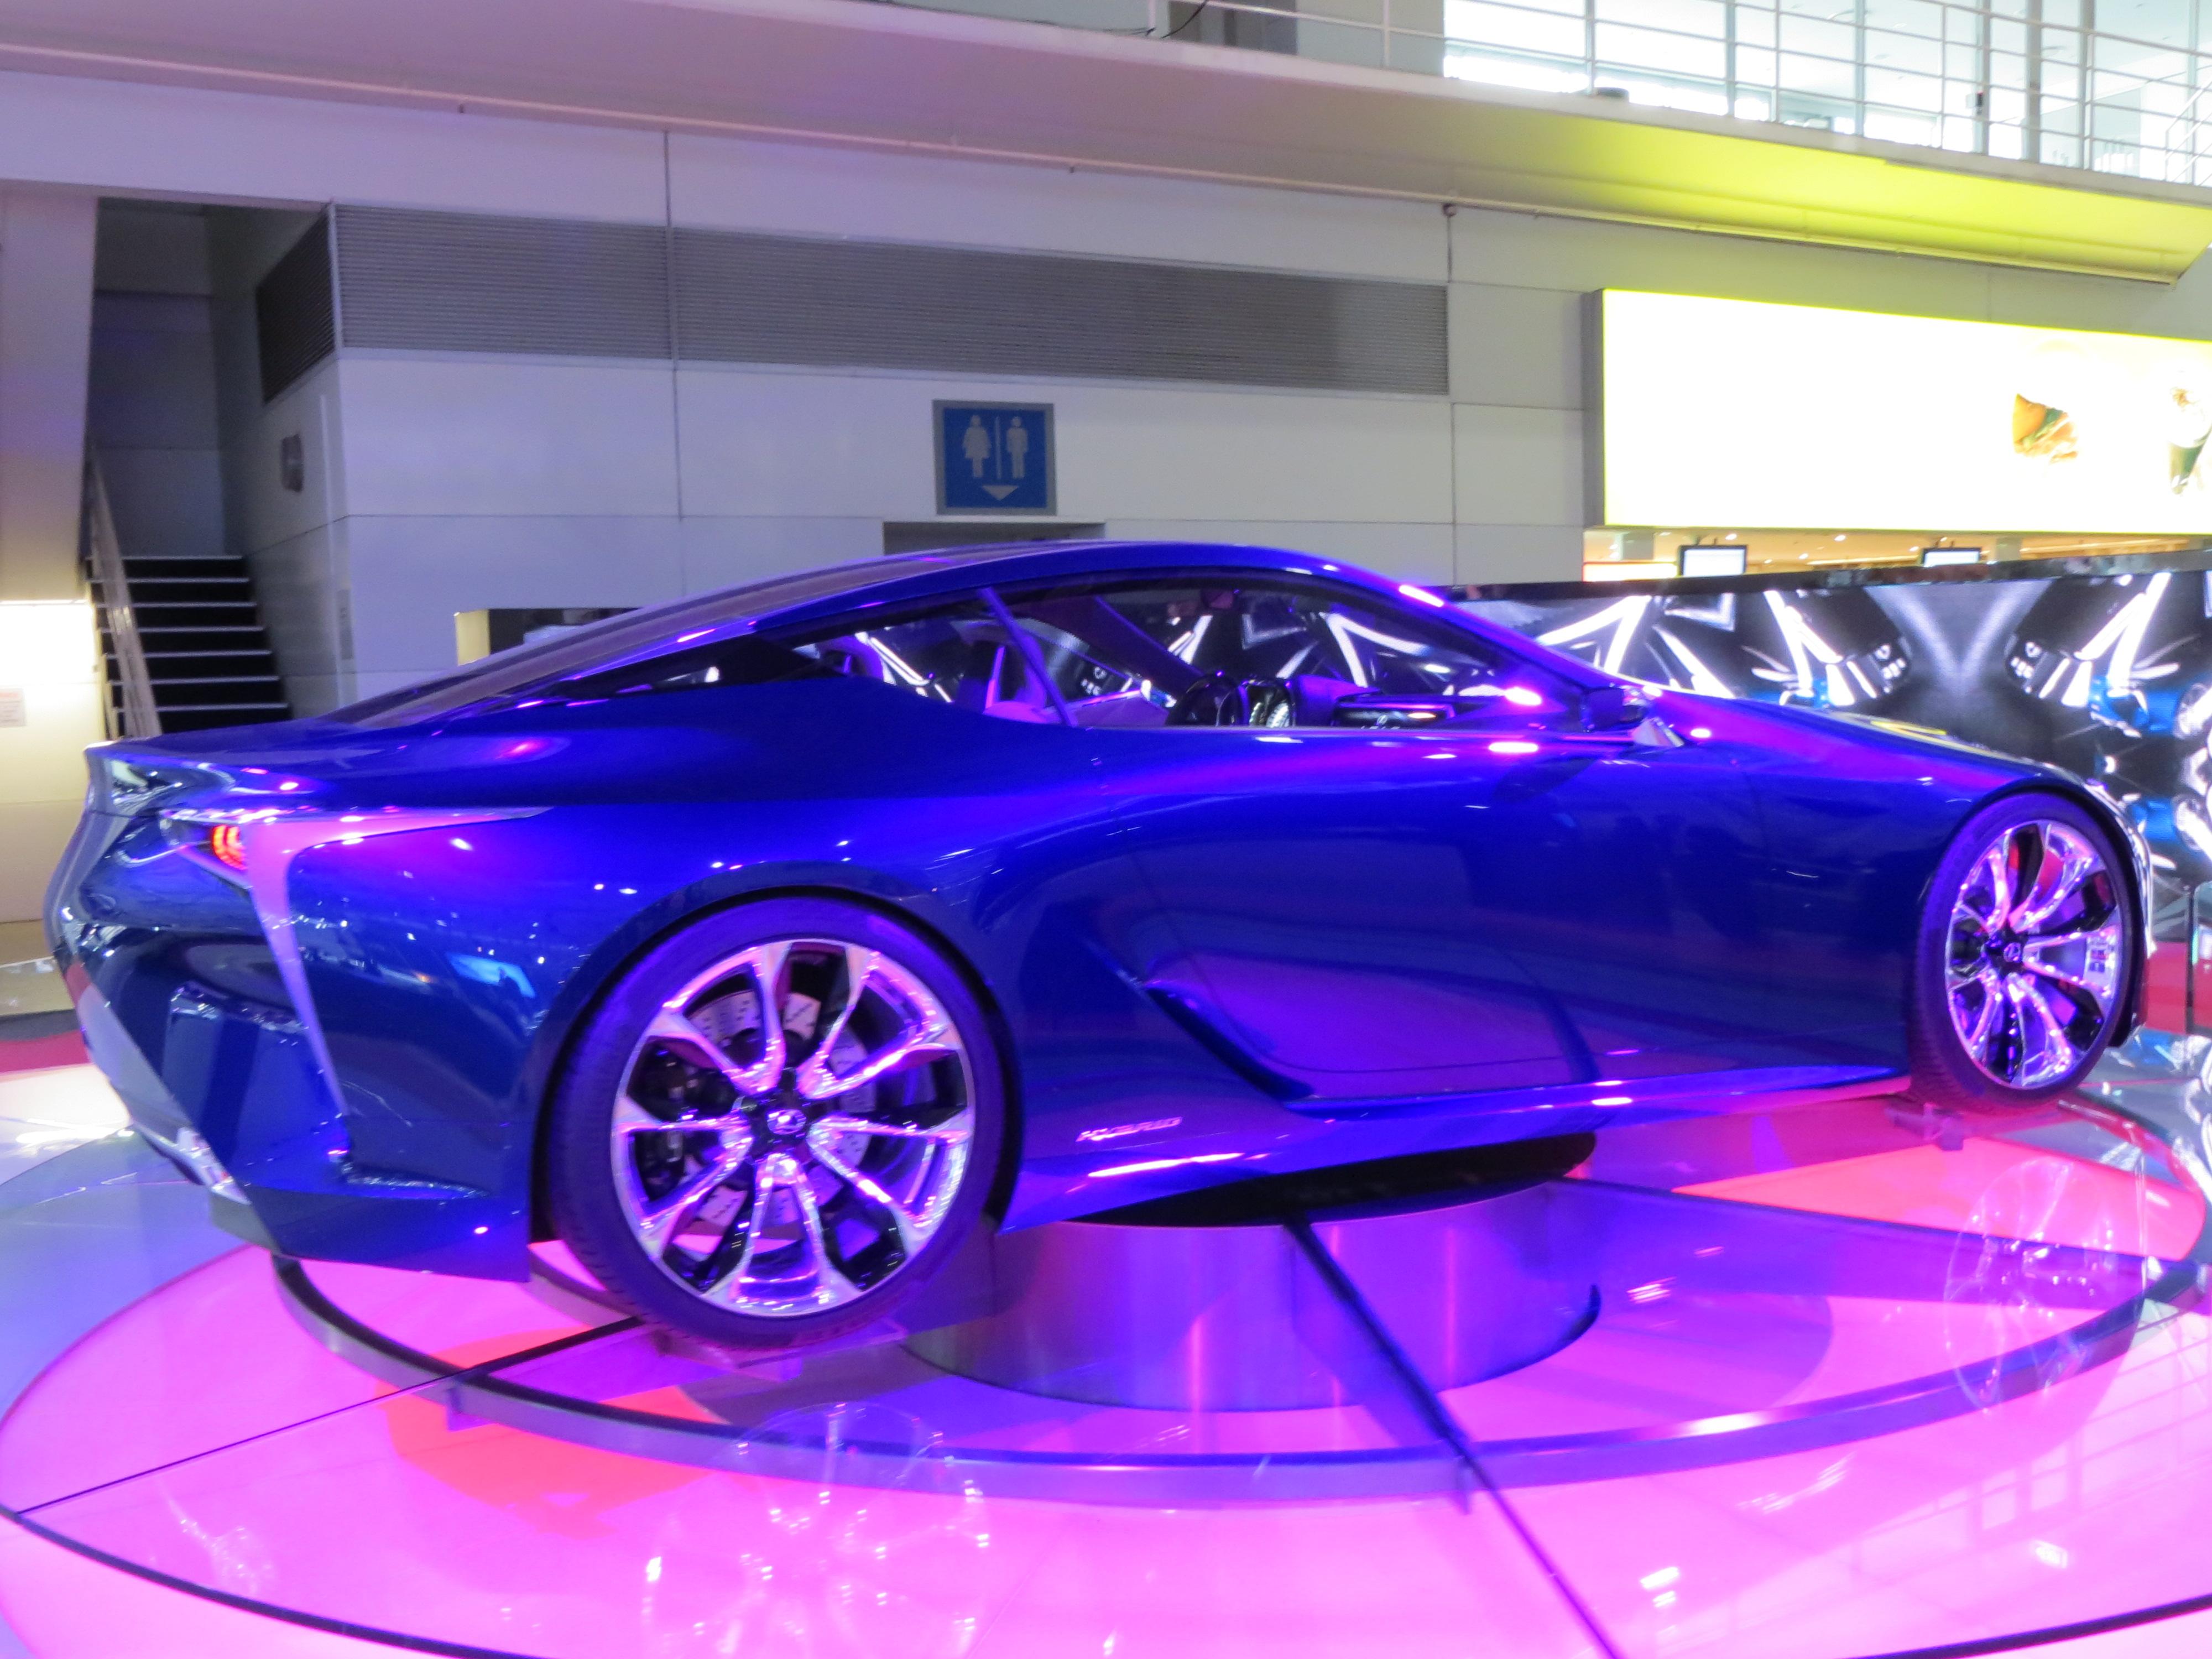 File:2012 Lexus LF-LC (concept) coupe (2012-10-26) 02.jpg ...